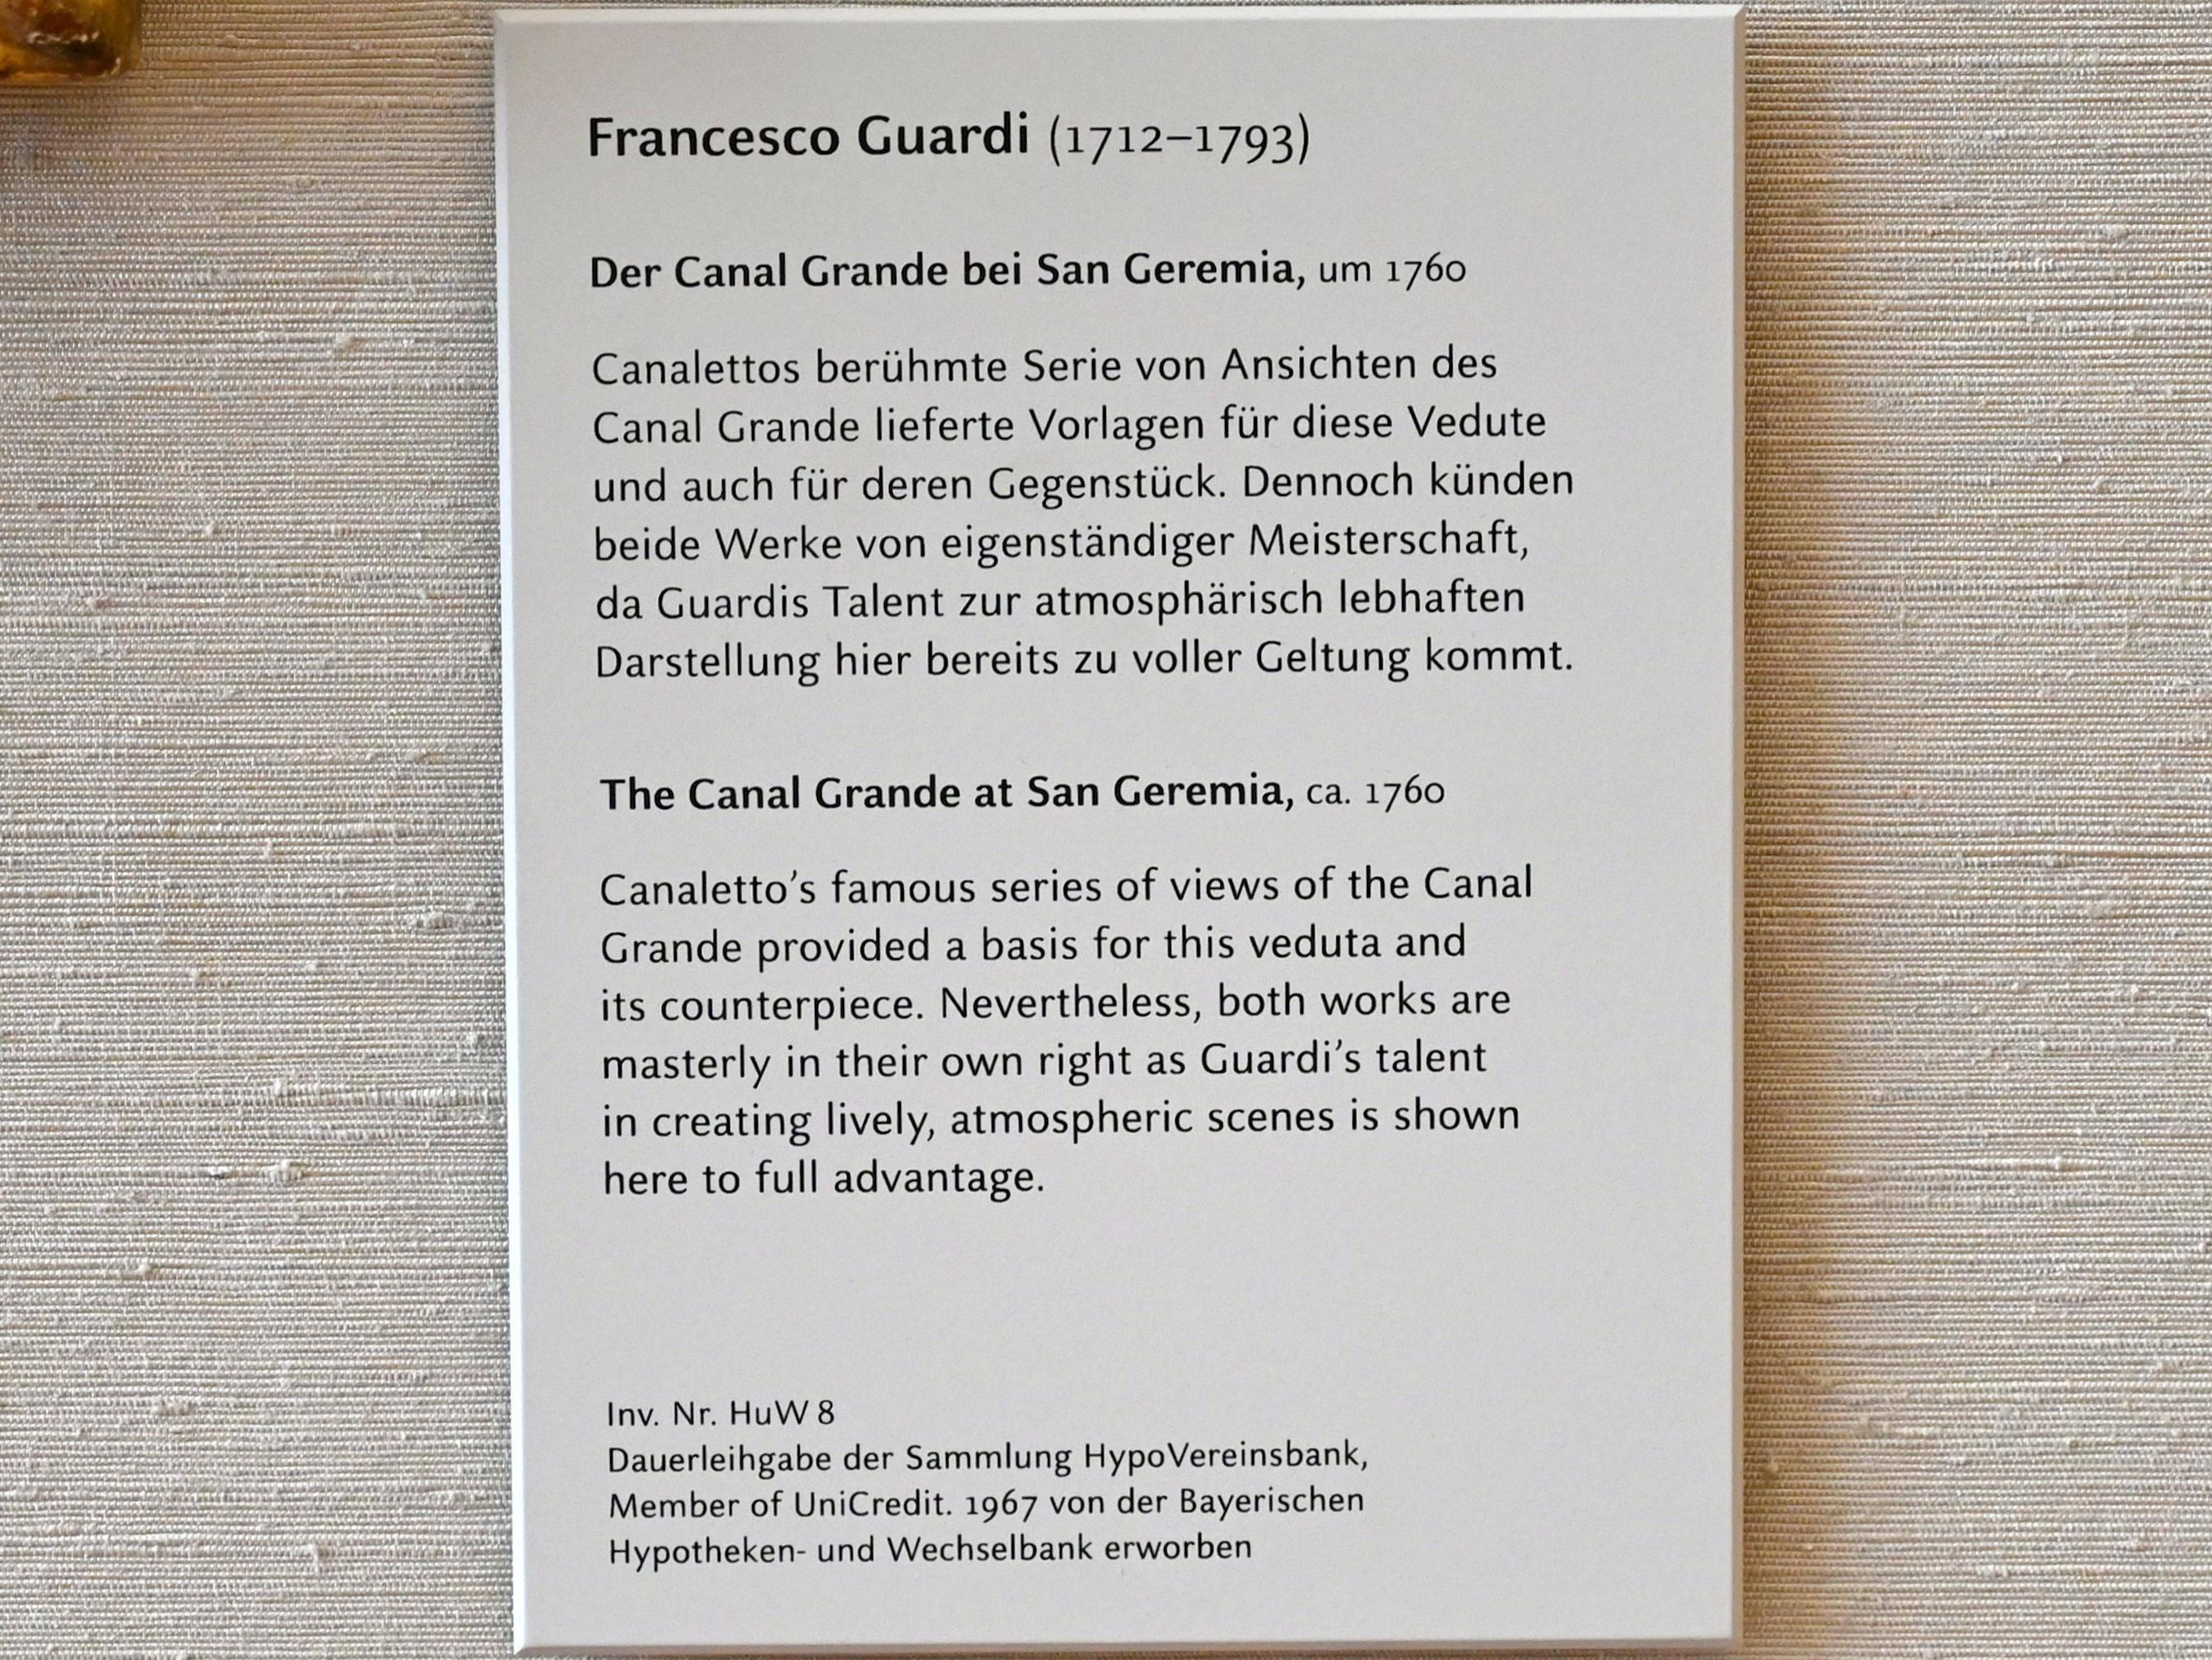 Francesco Guardi: Der Canal Grande bei San Geremia, Um 1760